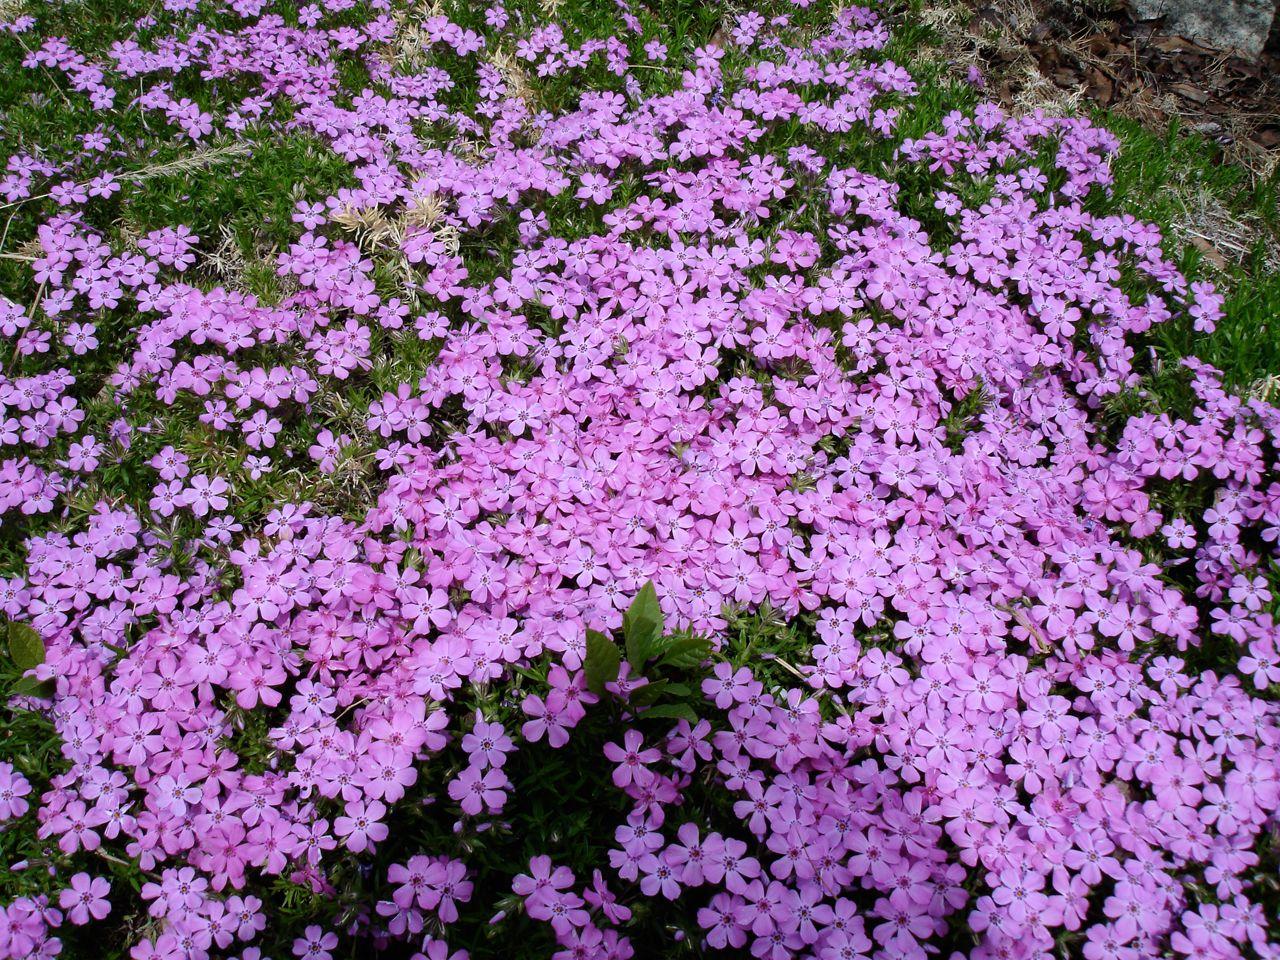 Nothing Beats Colorful Creeping Phlox As A Perennial Spring Ground